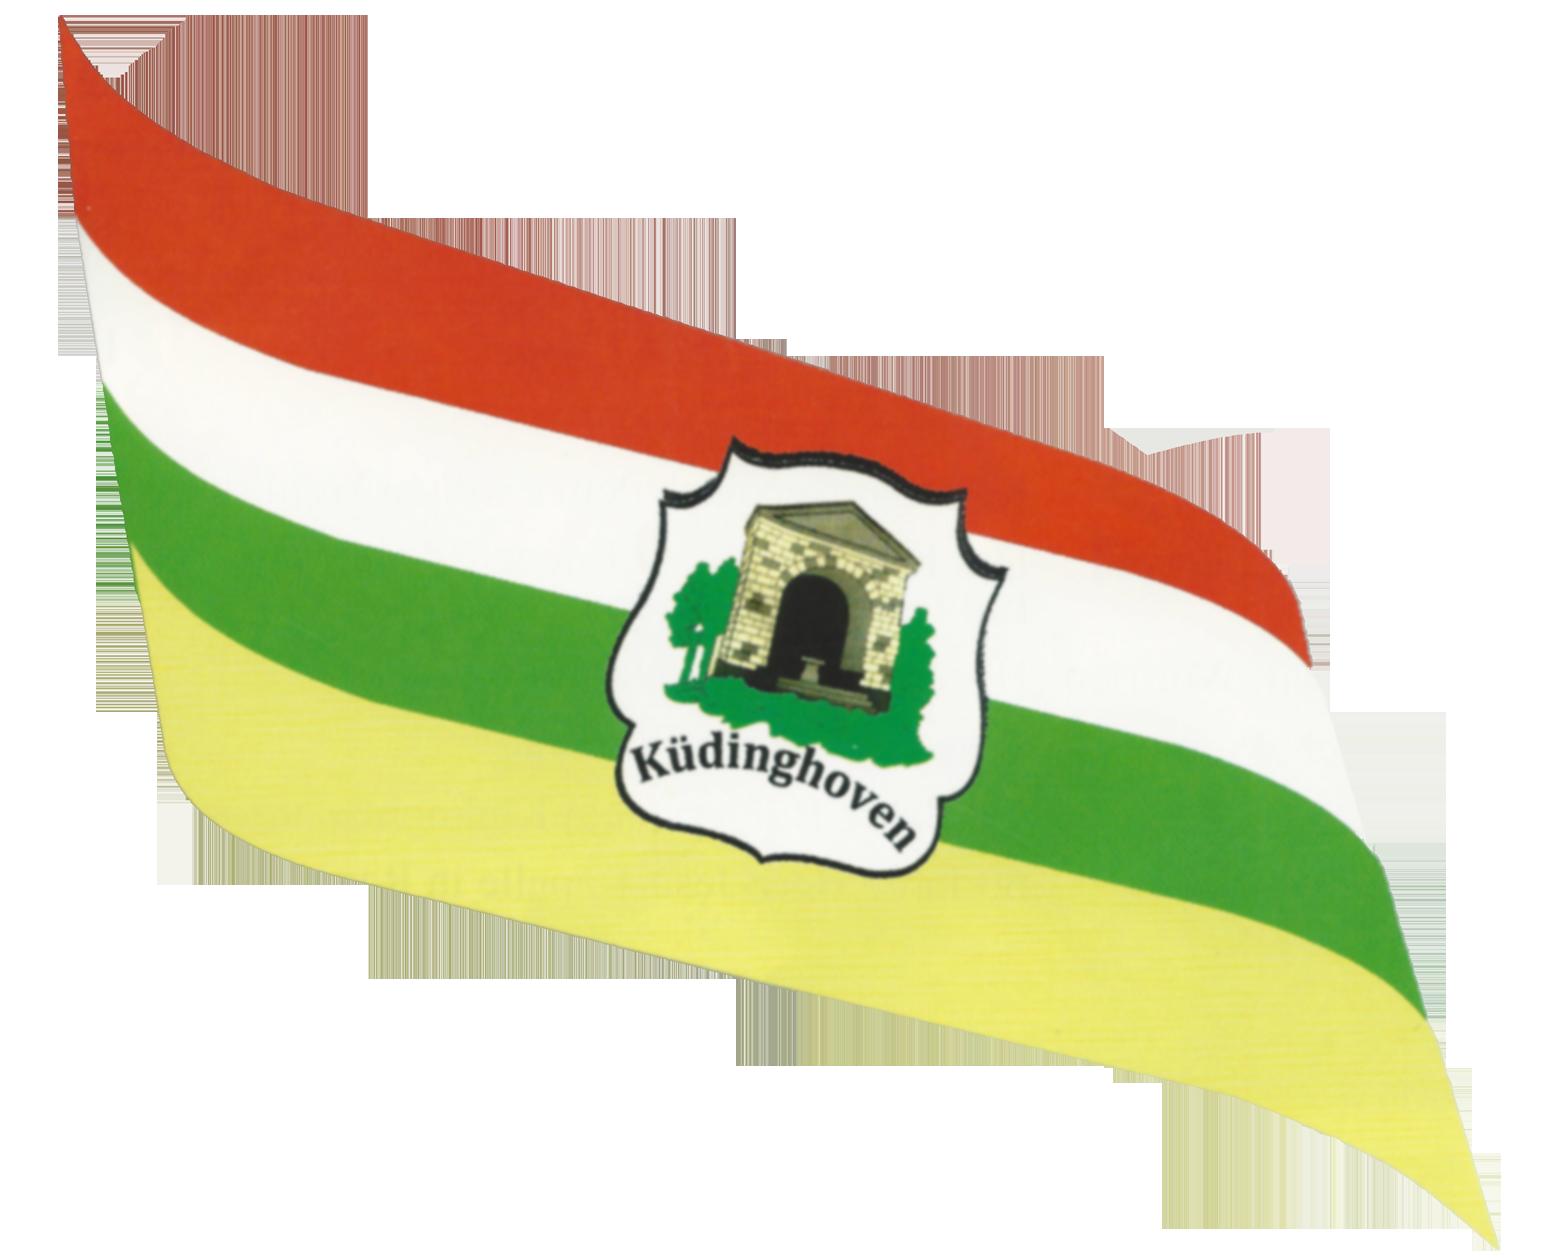 Bürgerverein Küdinghoven